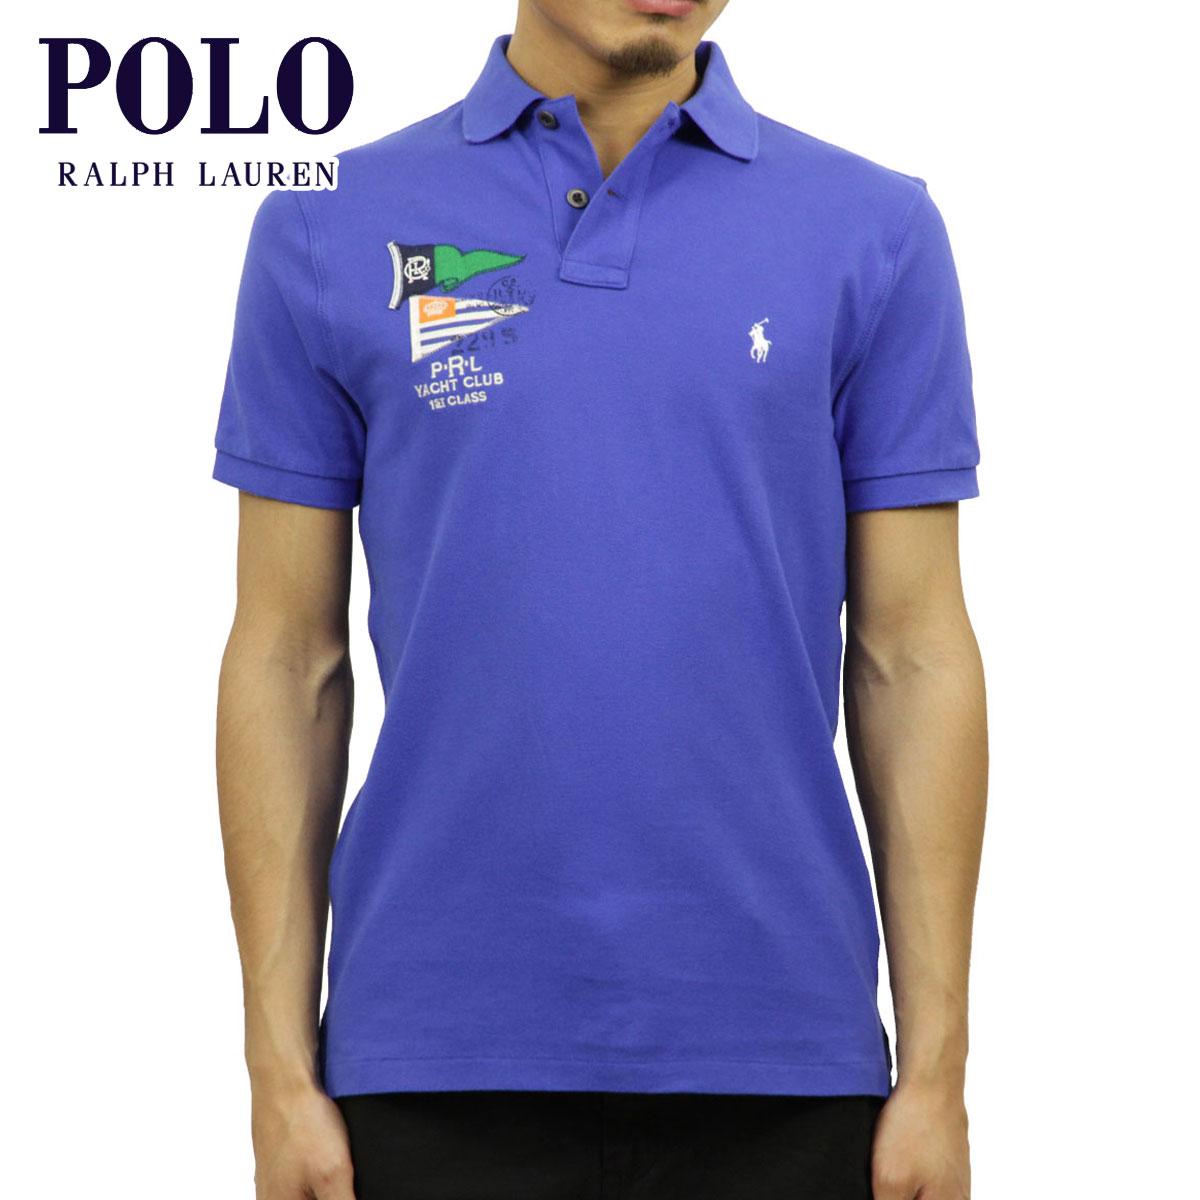 f106df38f Polo Ralph Lauren POLO RALPH LAUREN regular article men custom fitting  short sleeves polo shirt FLAG ...